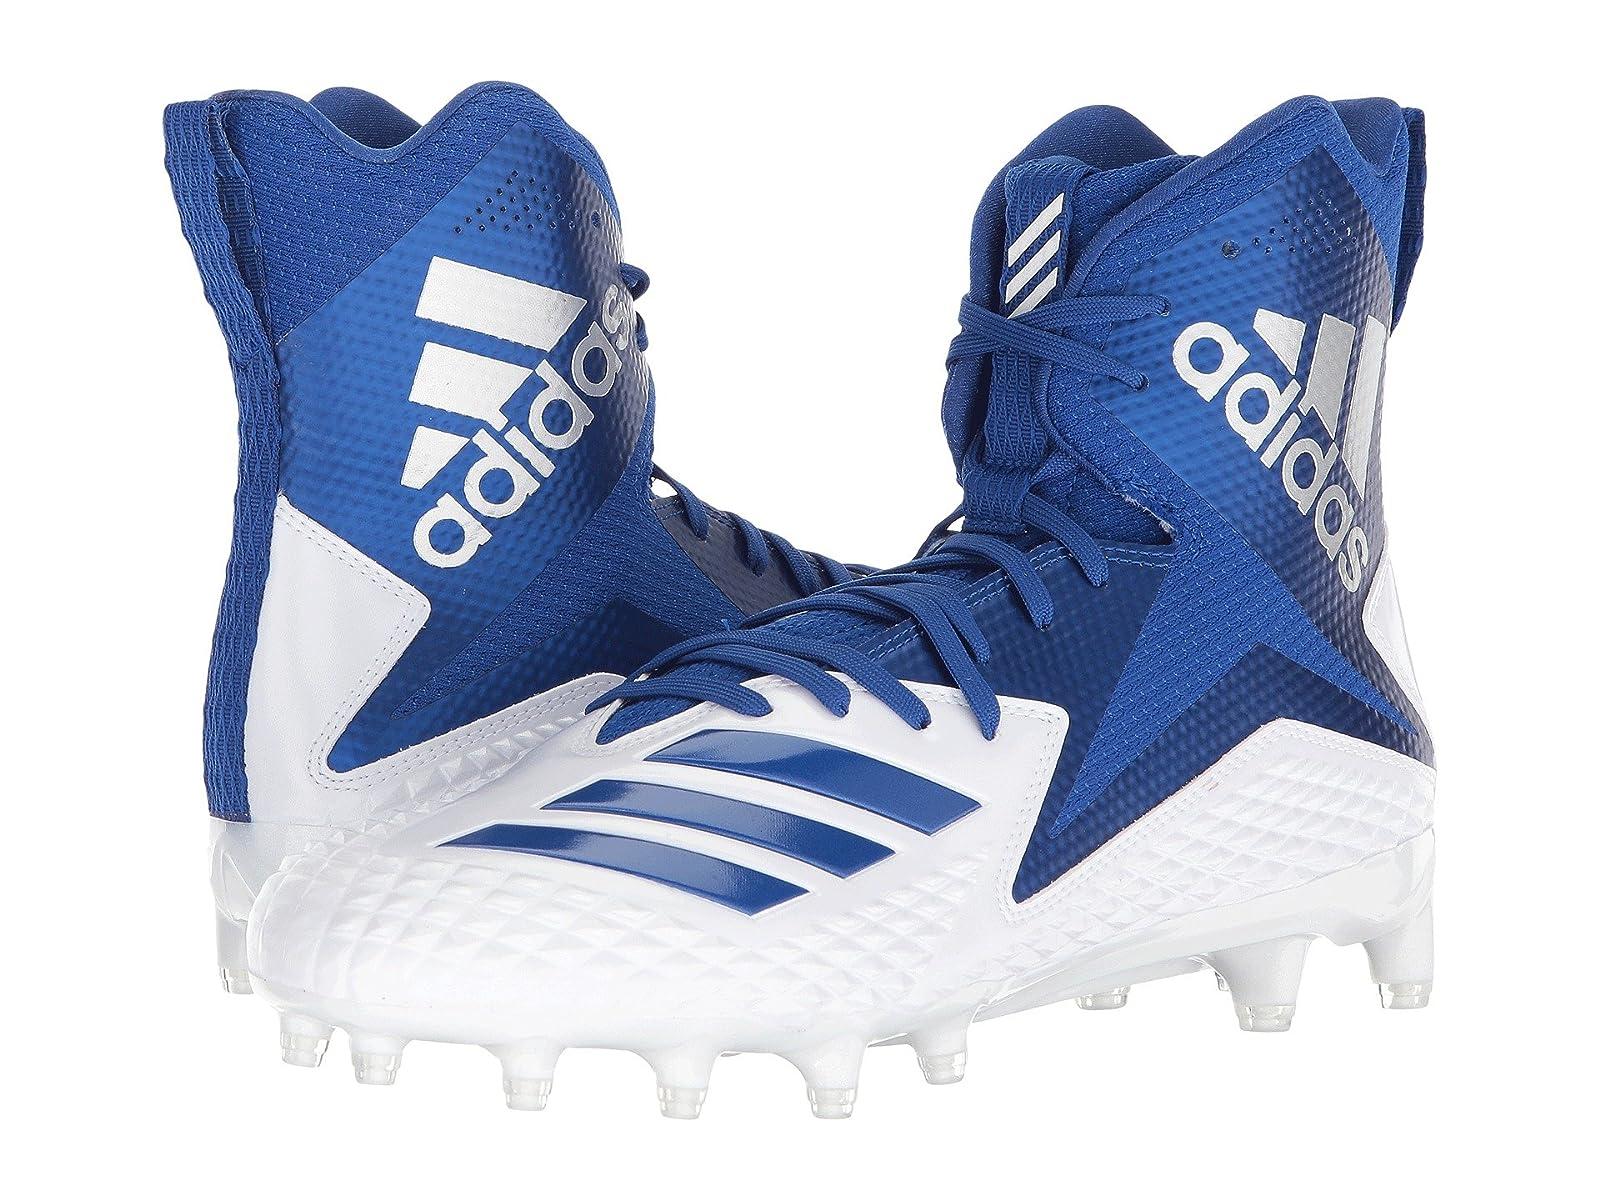 adidas Freak x Carbon High High High 3f0856